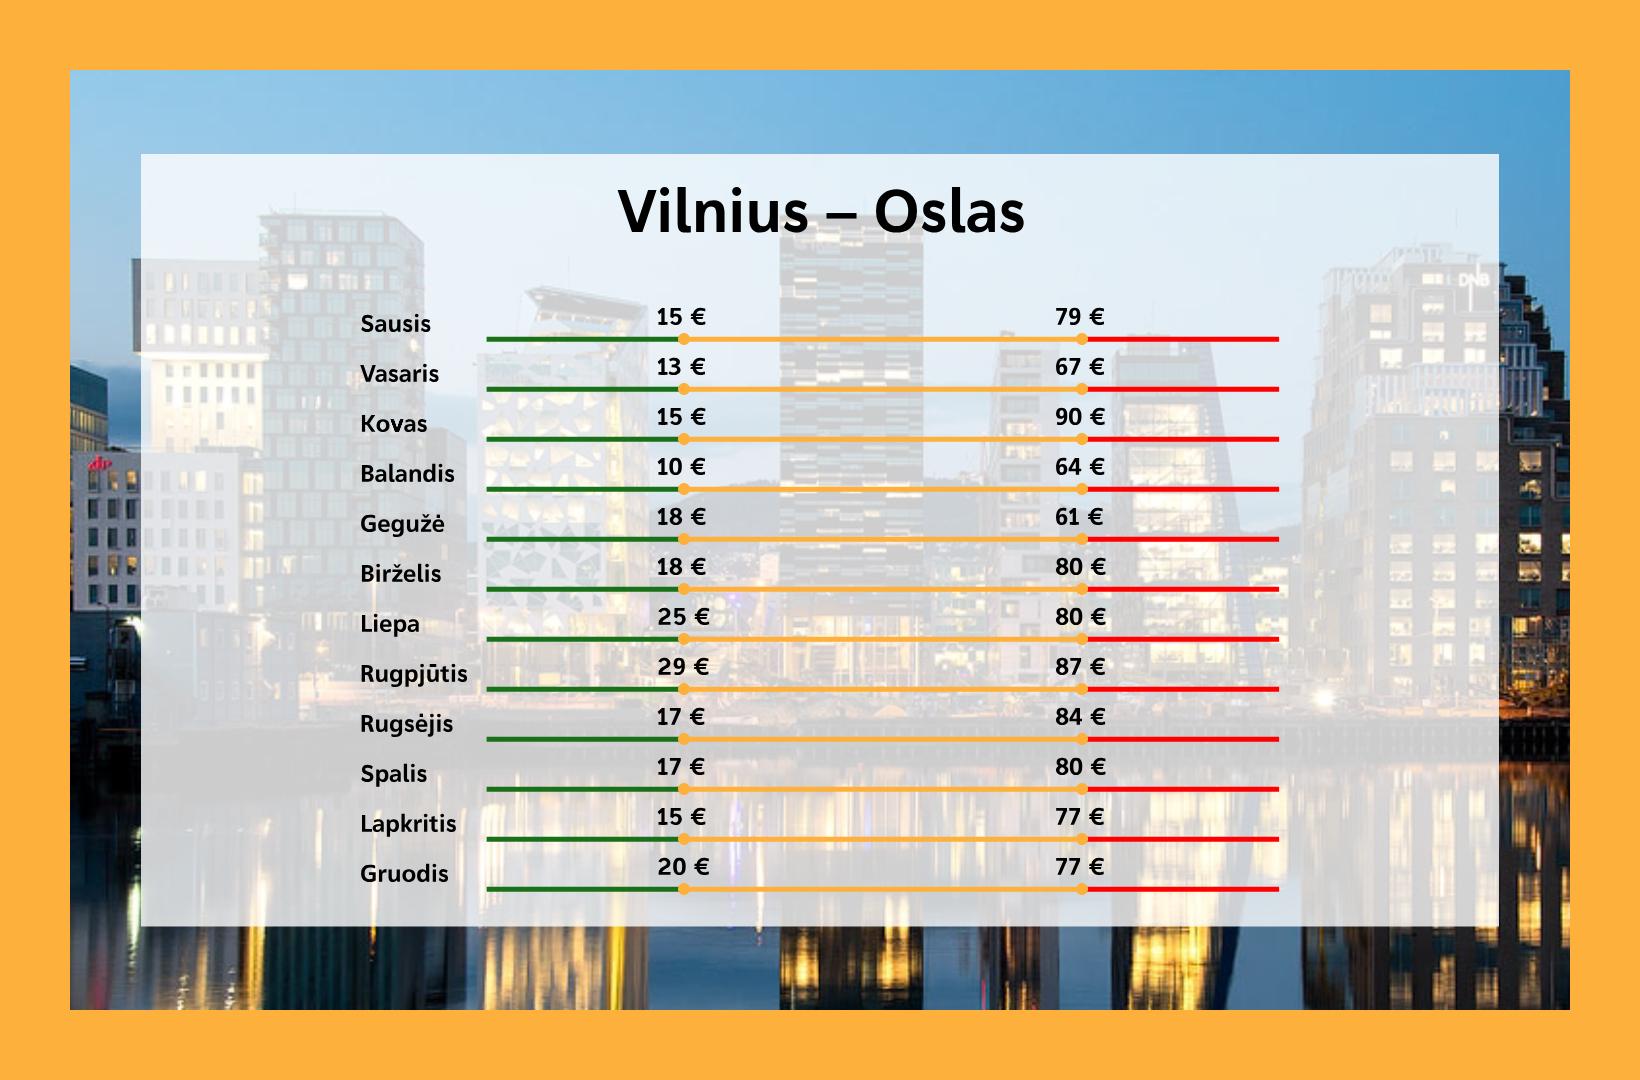 Kada pigiausi lektuvu bilietai i Osla is Vilniaus